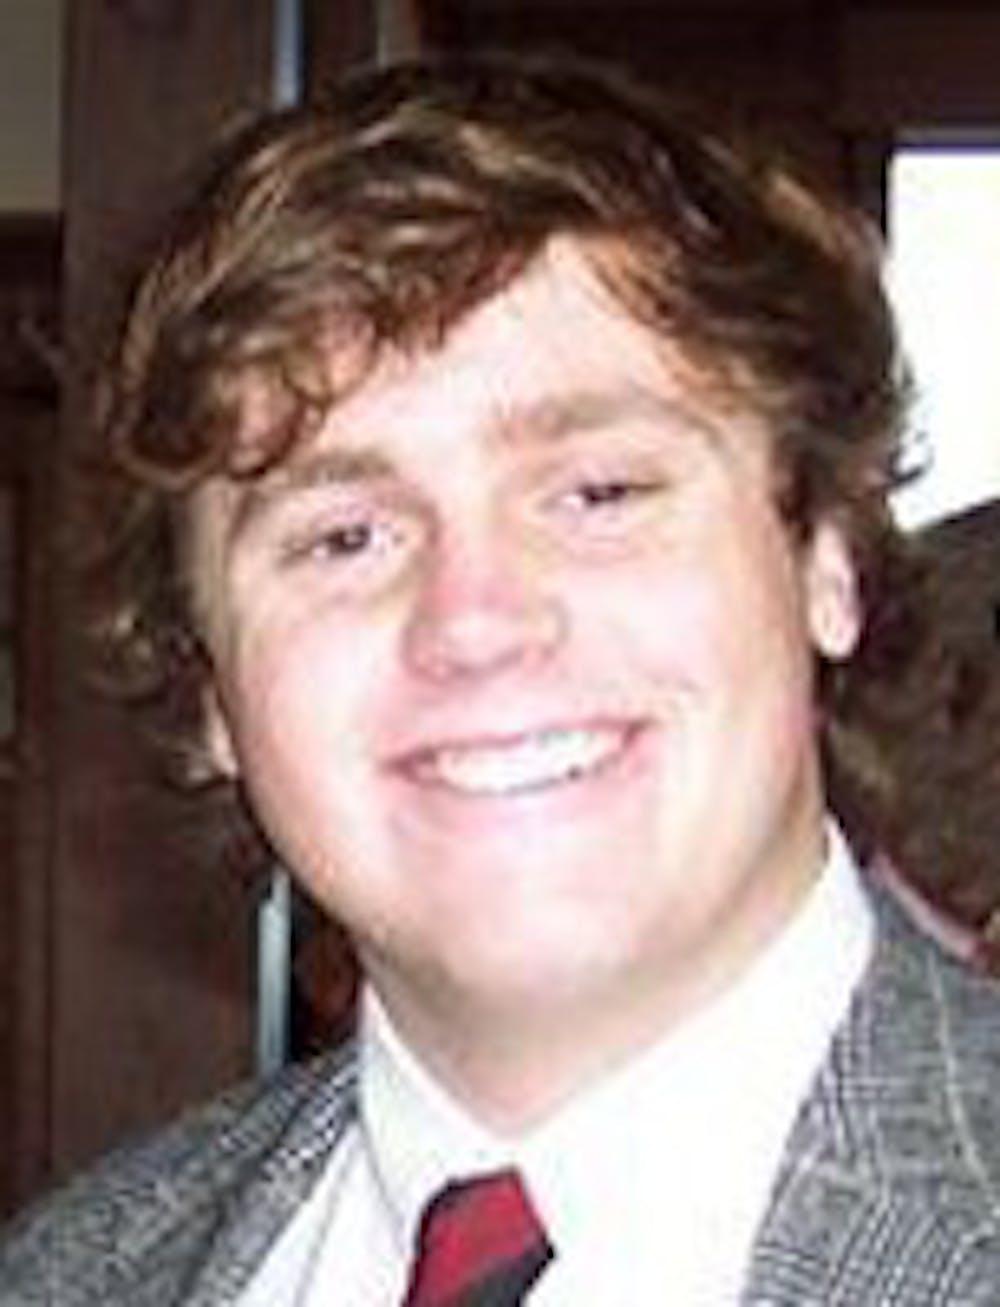 Junior Stedman Gage remembered as happy, loyal